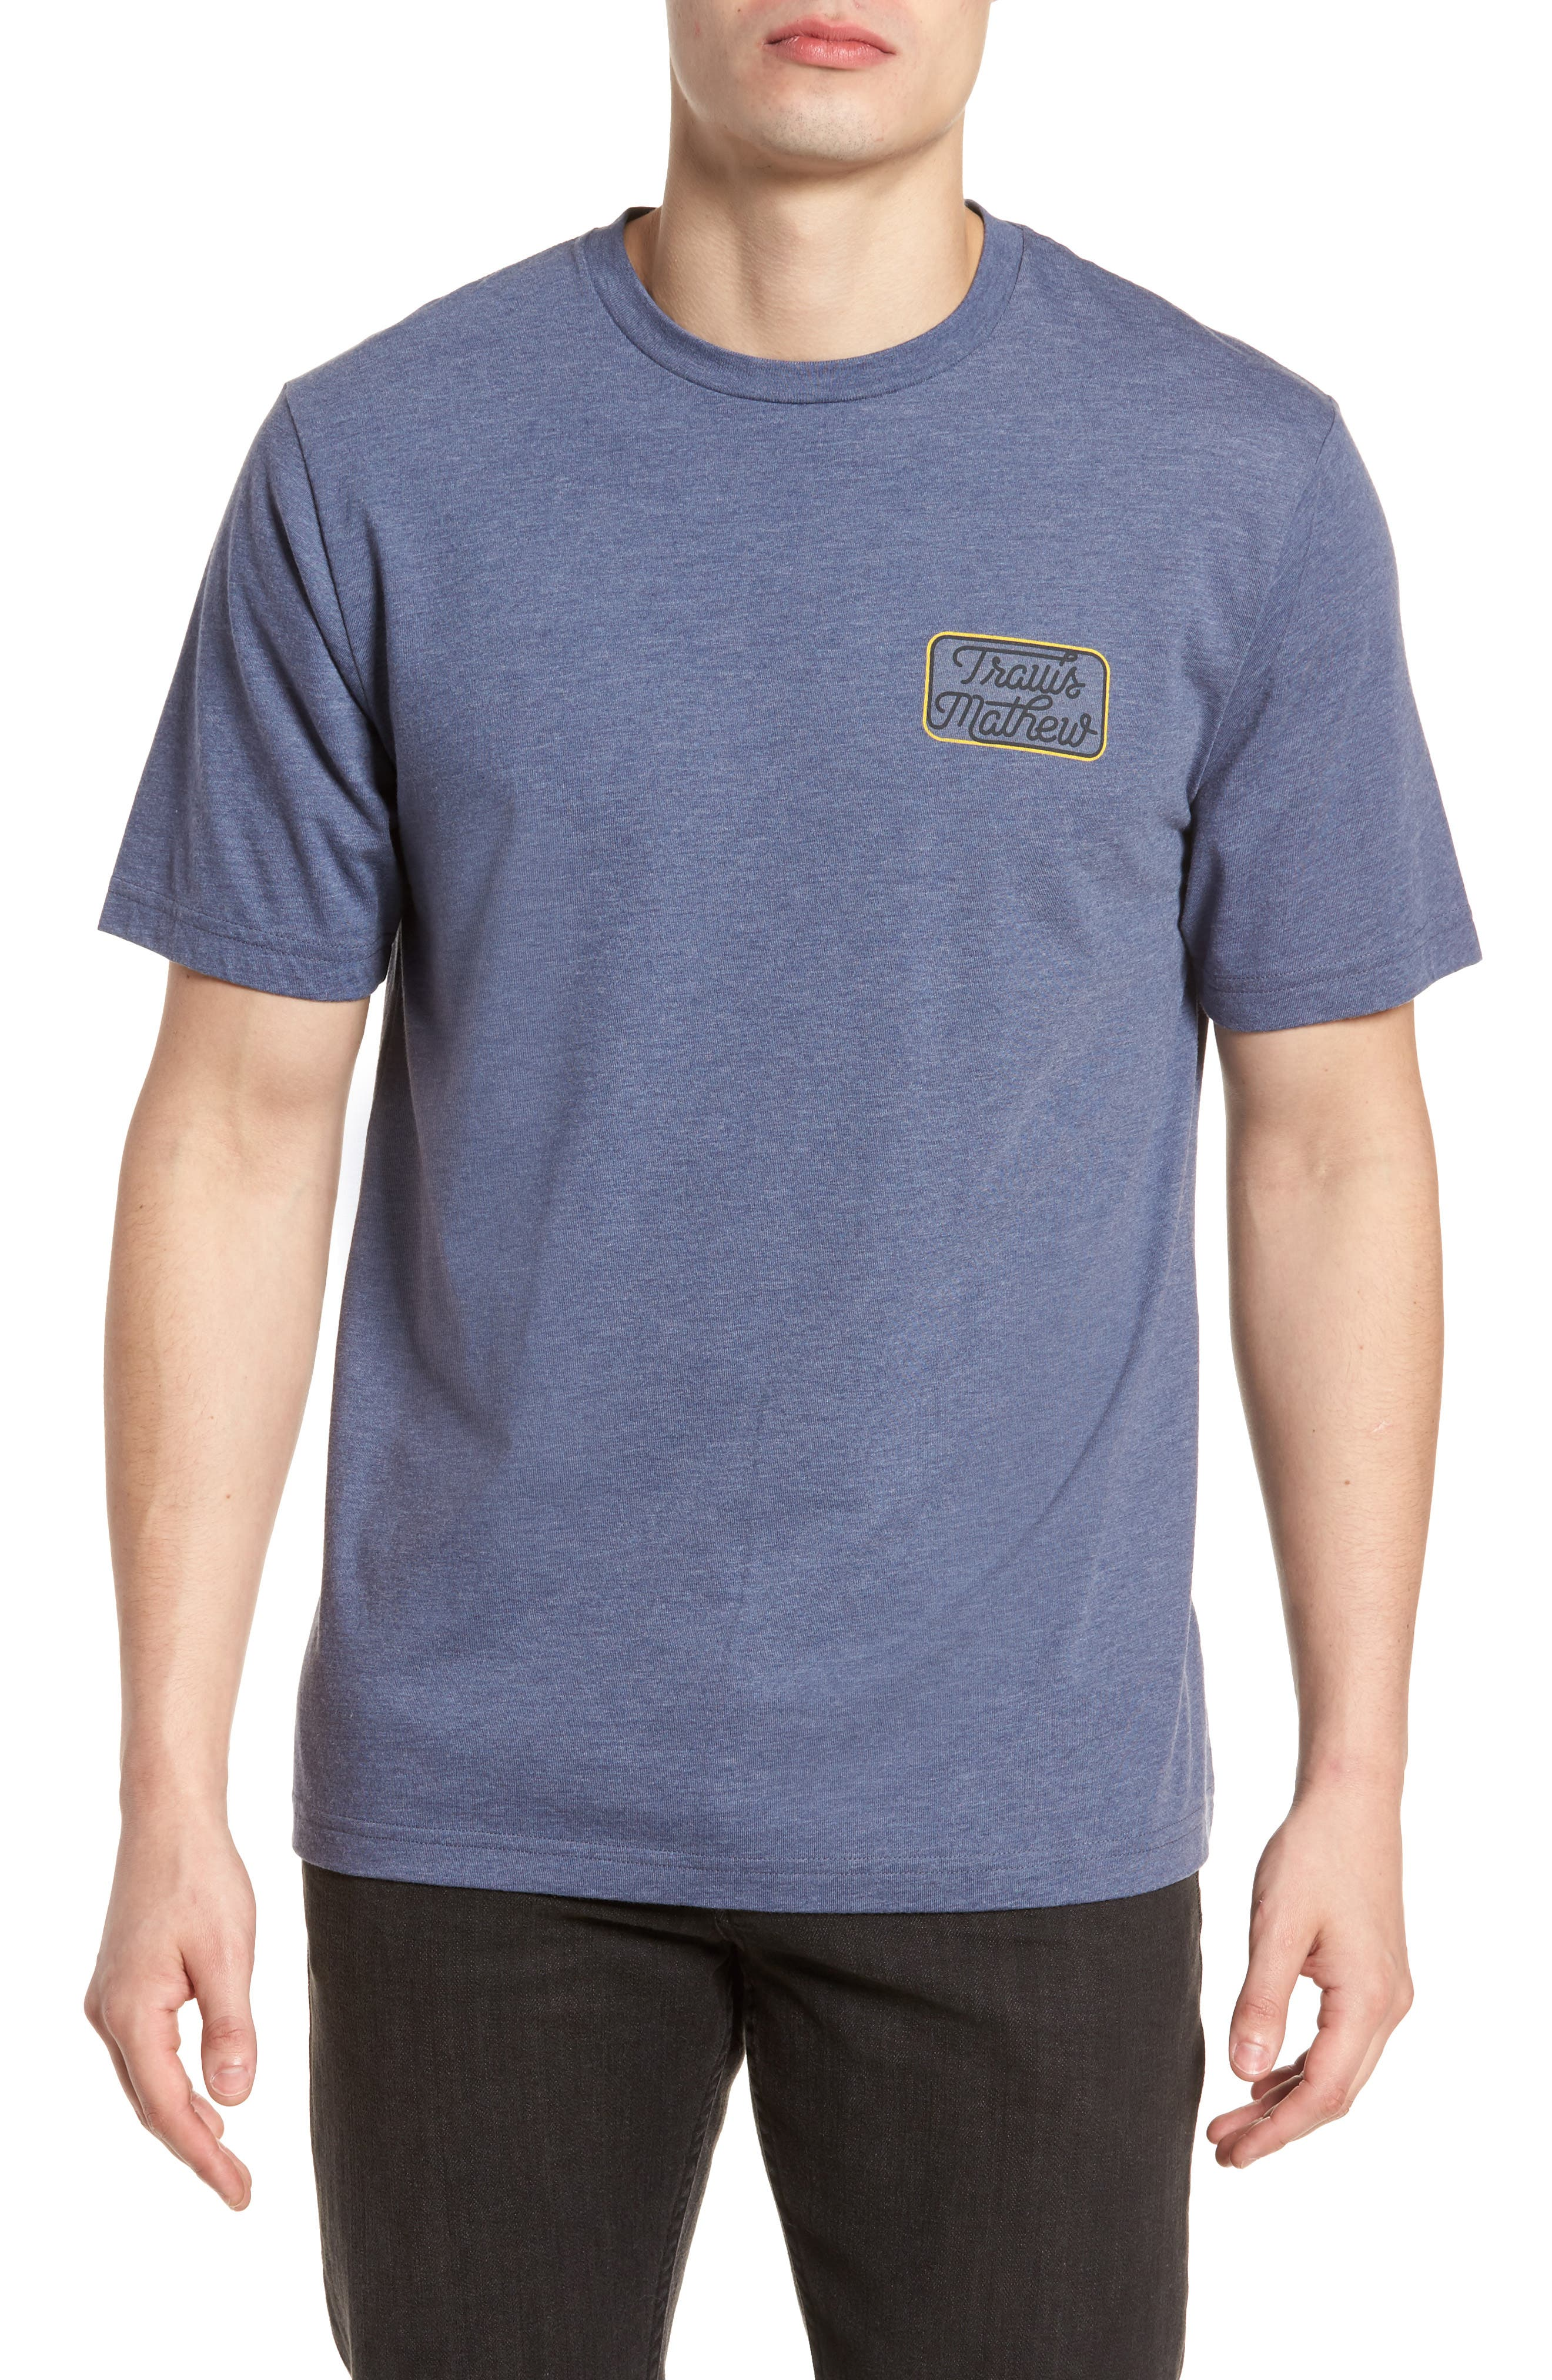 TRAVIS MATHEW Truck Stop Graphic T-Shirt, Main, color, 400